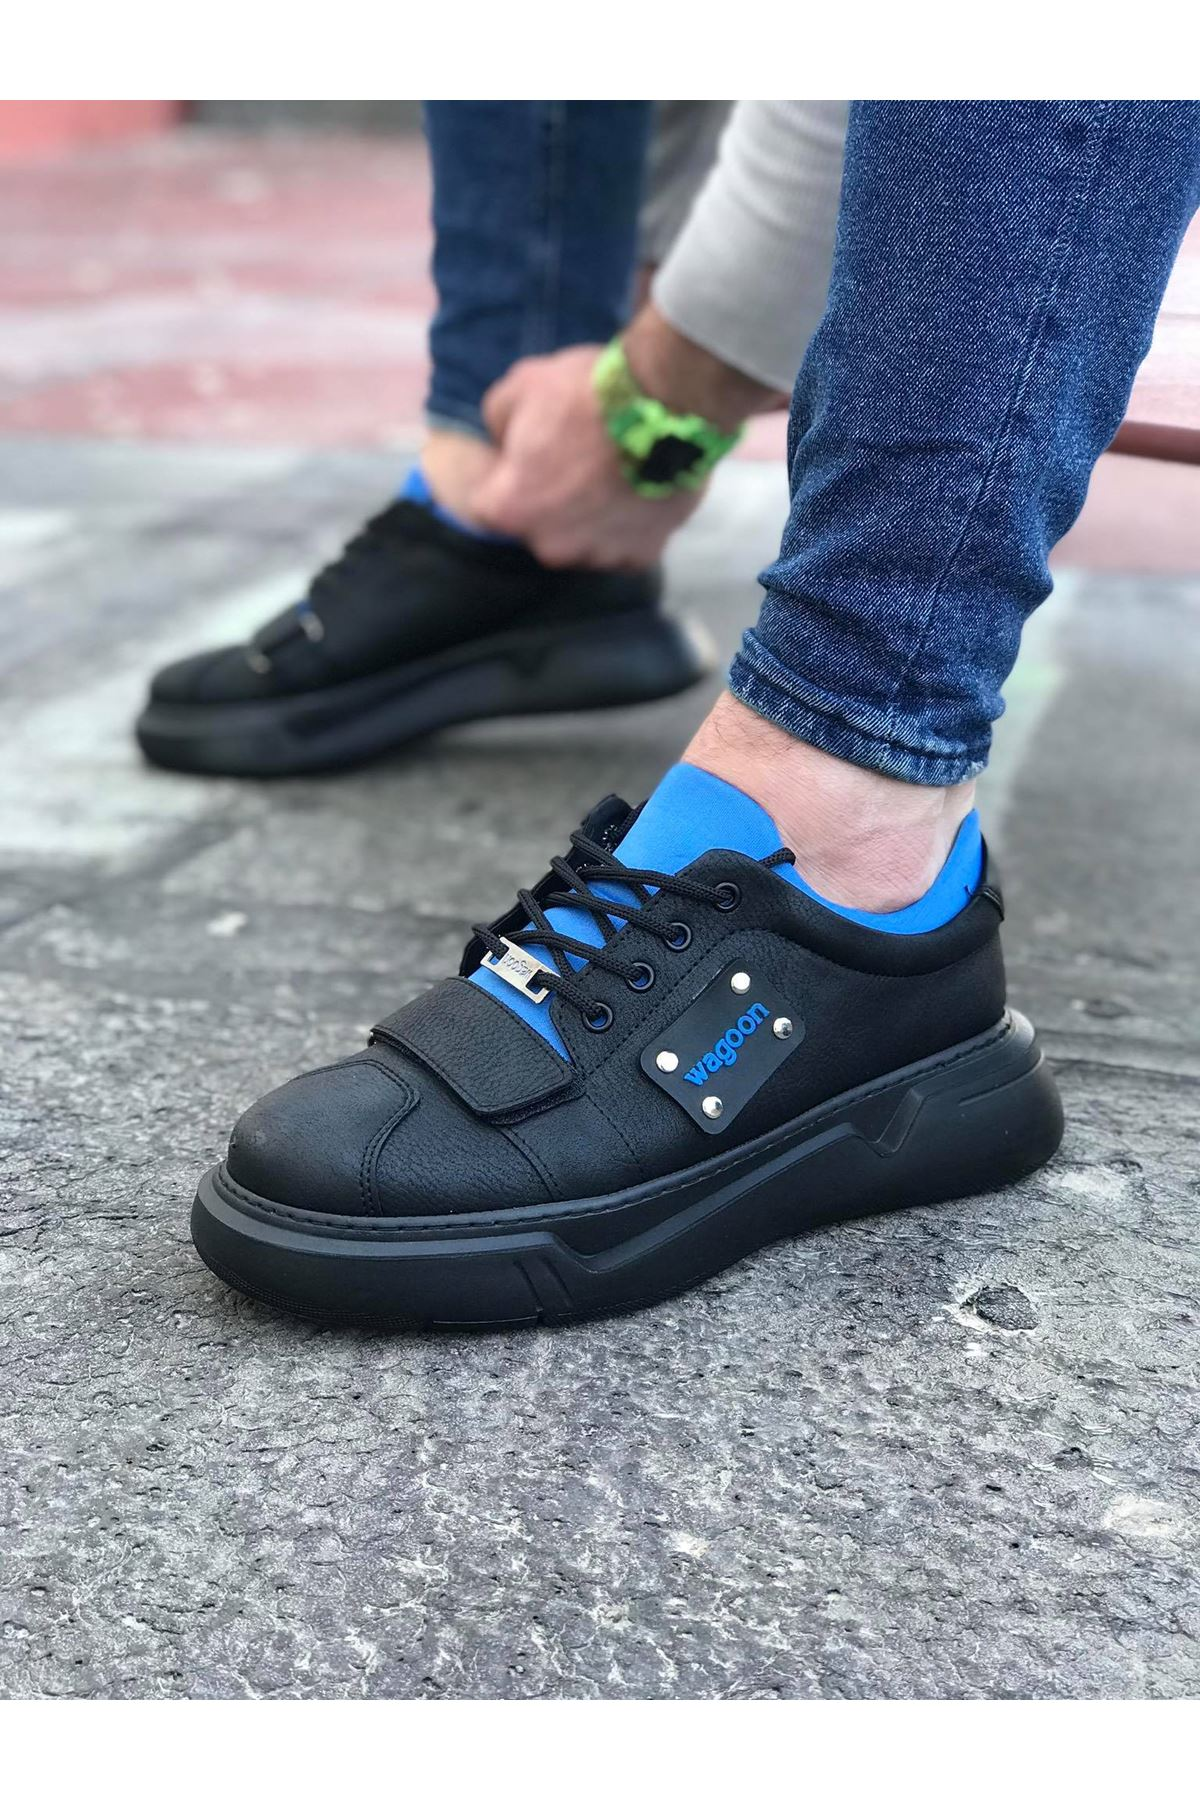 Wagoon WG018 Siyah Sax Erkek Yüksek Taban Ayakkabı